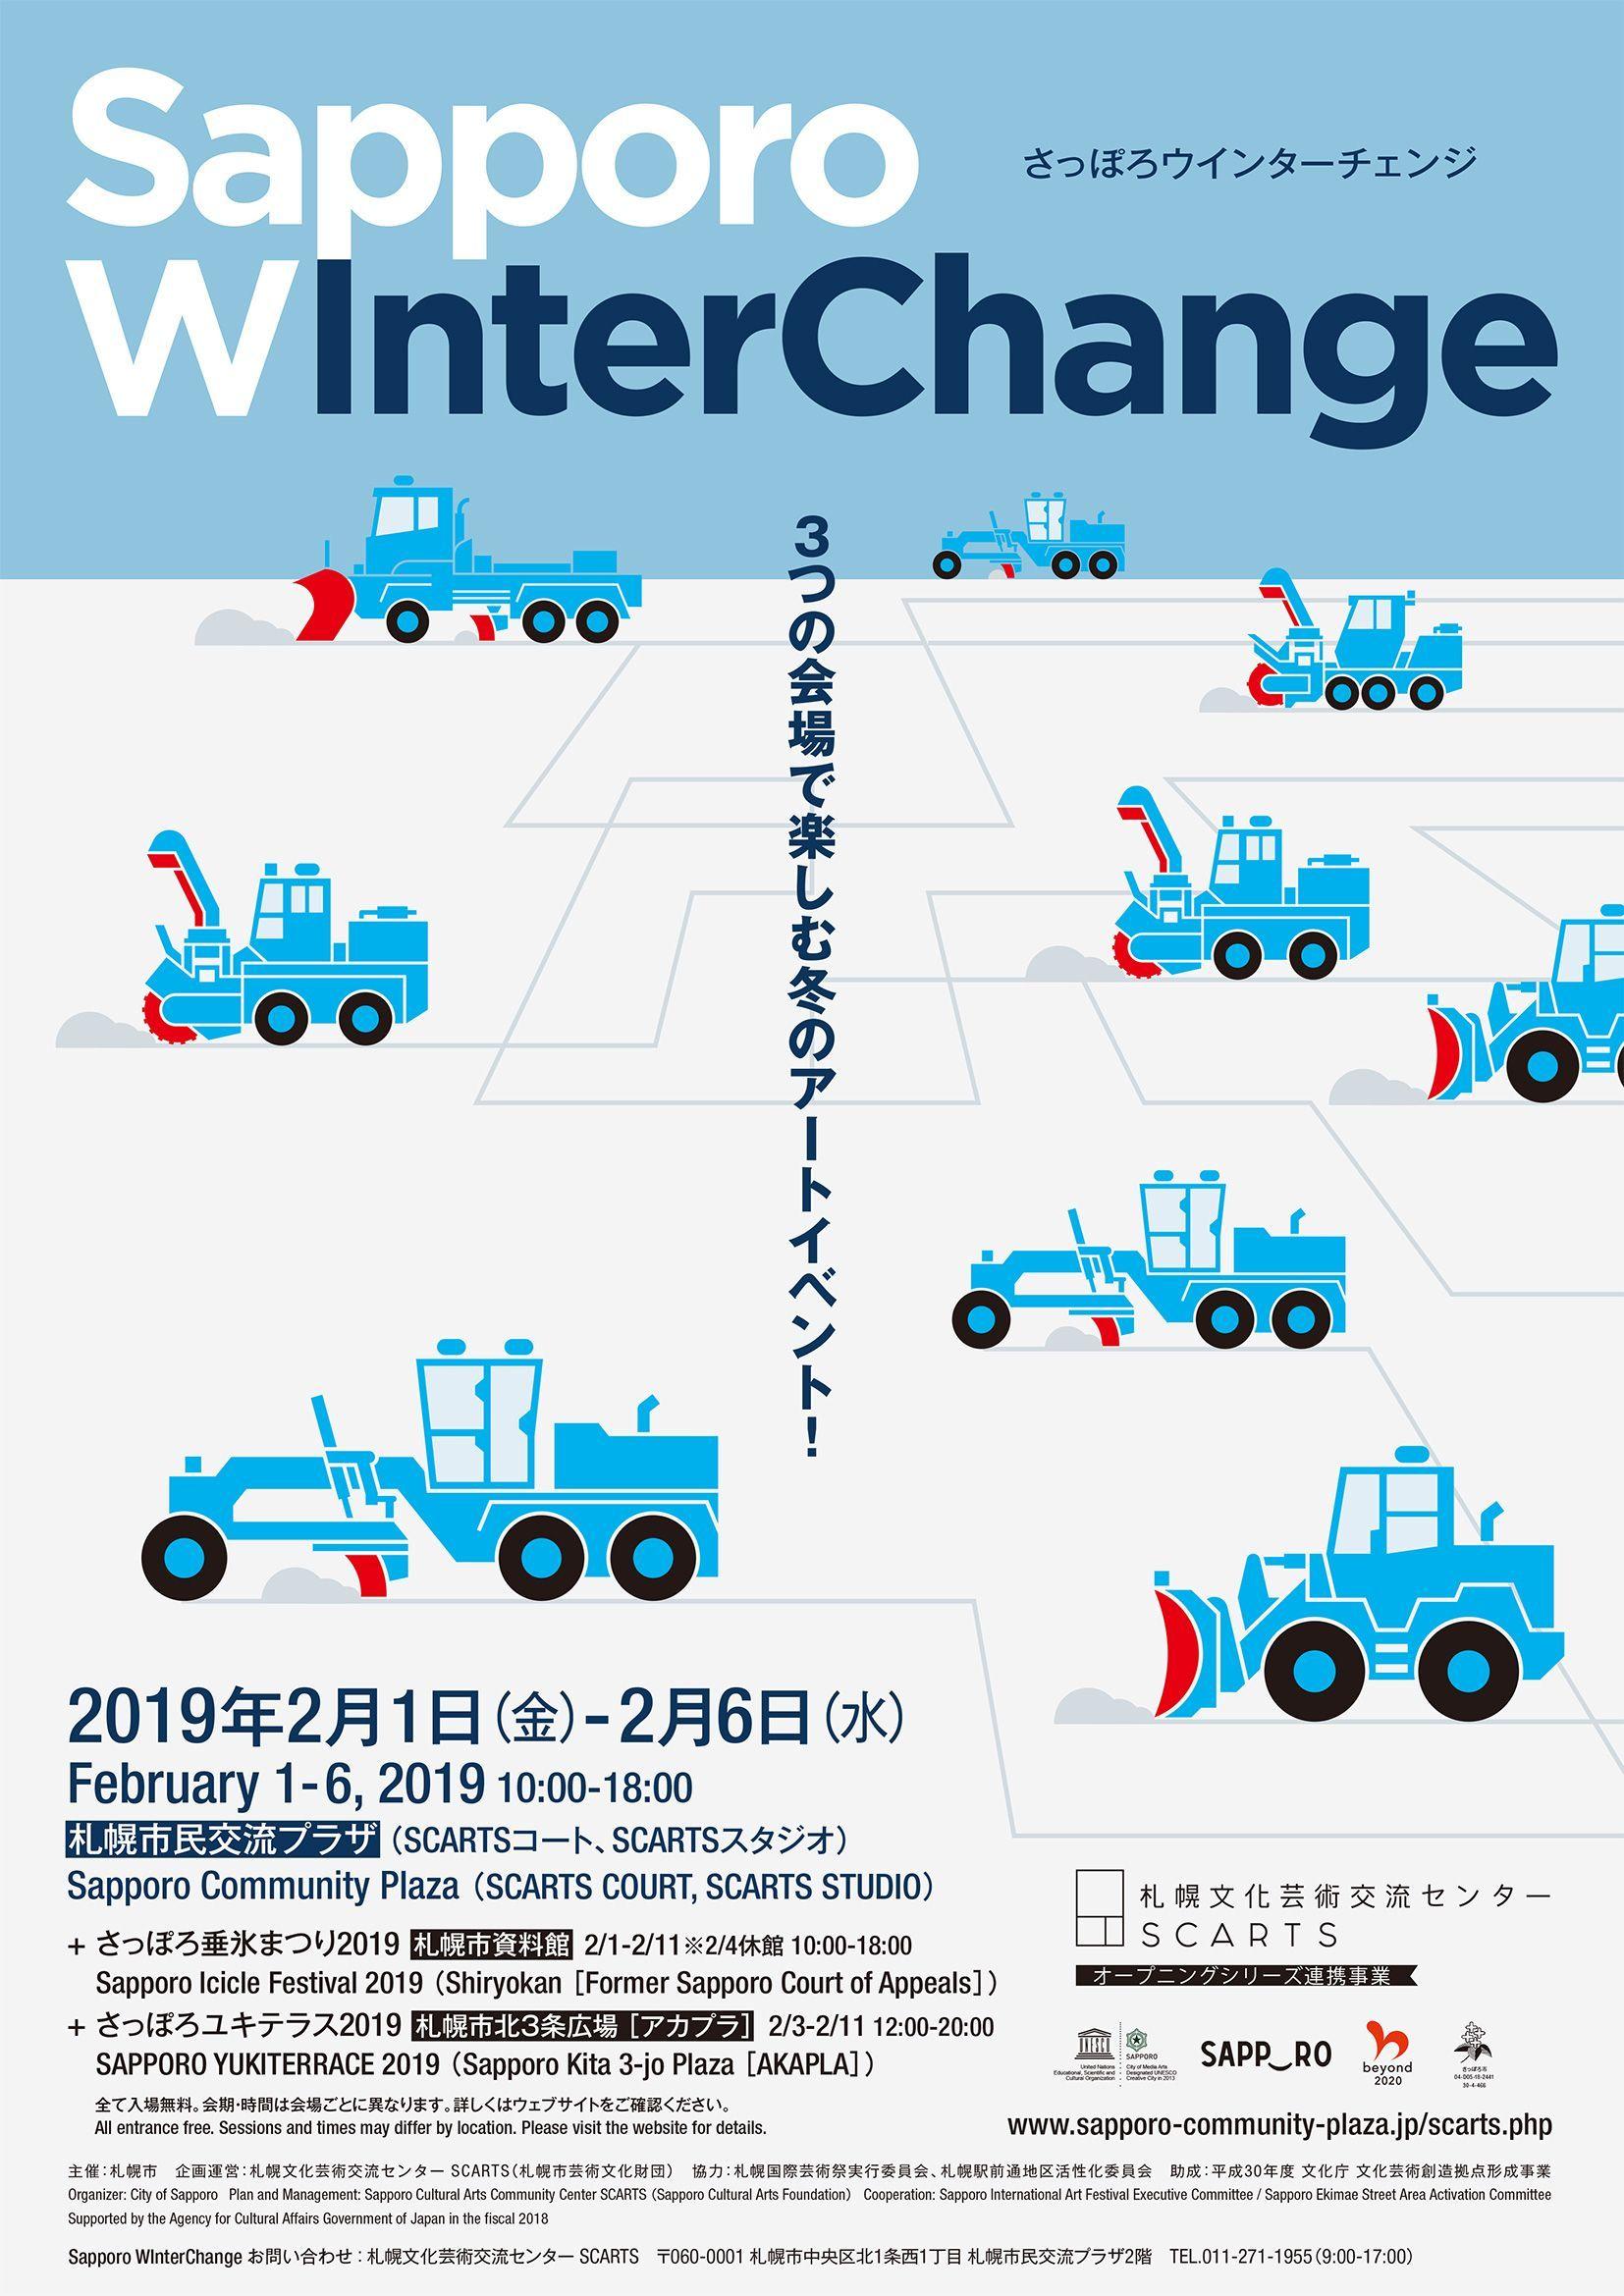 【Sapporo WInterChange】展示 「SNOW PLOW TRACE ─雪の痕跡─」 イメージ画像